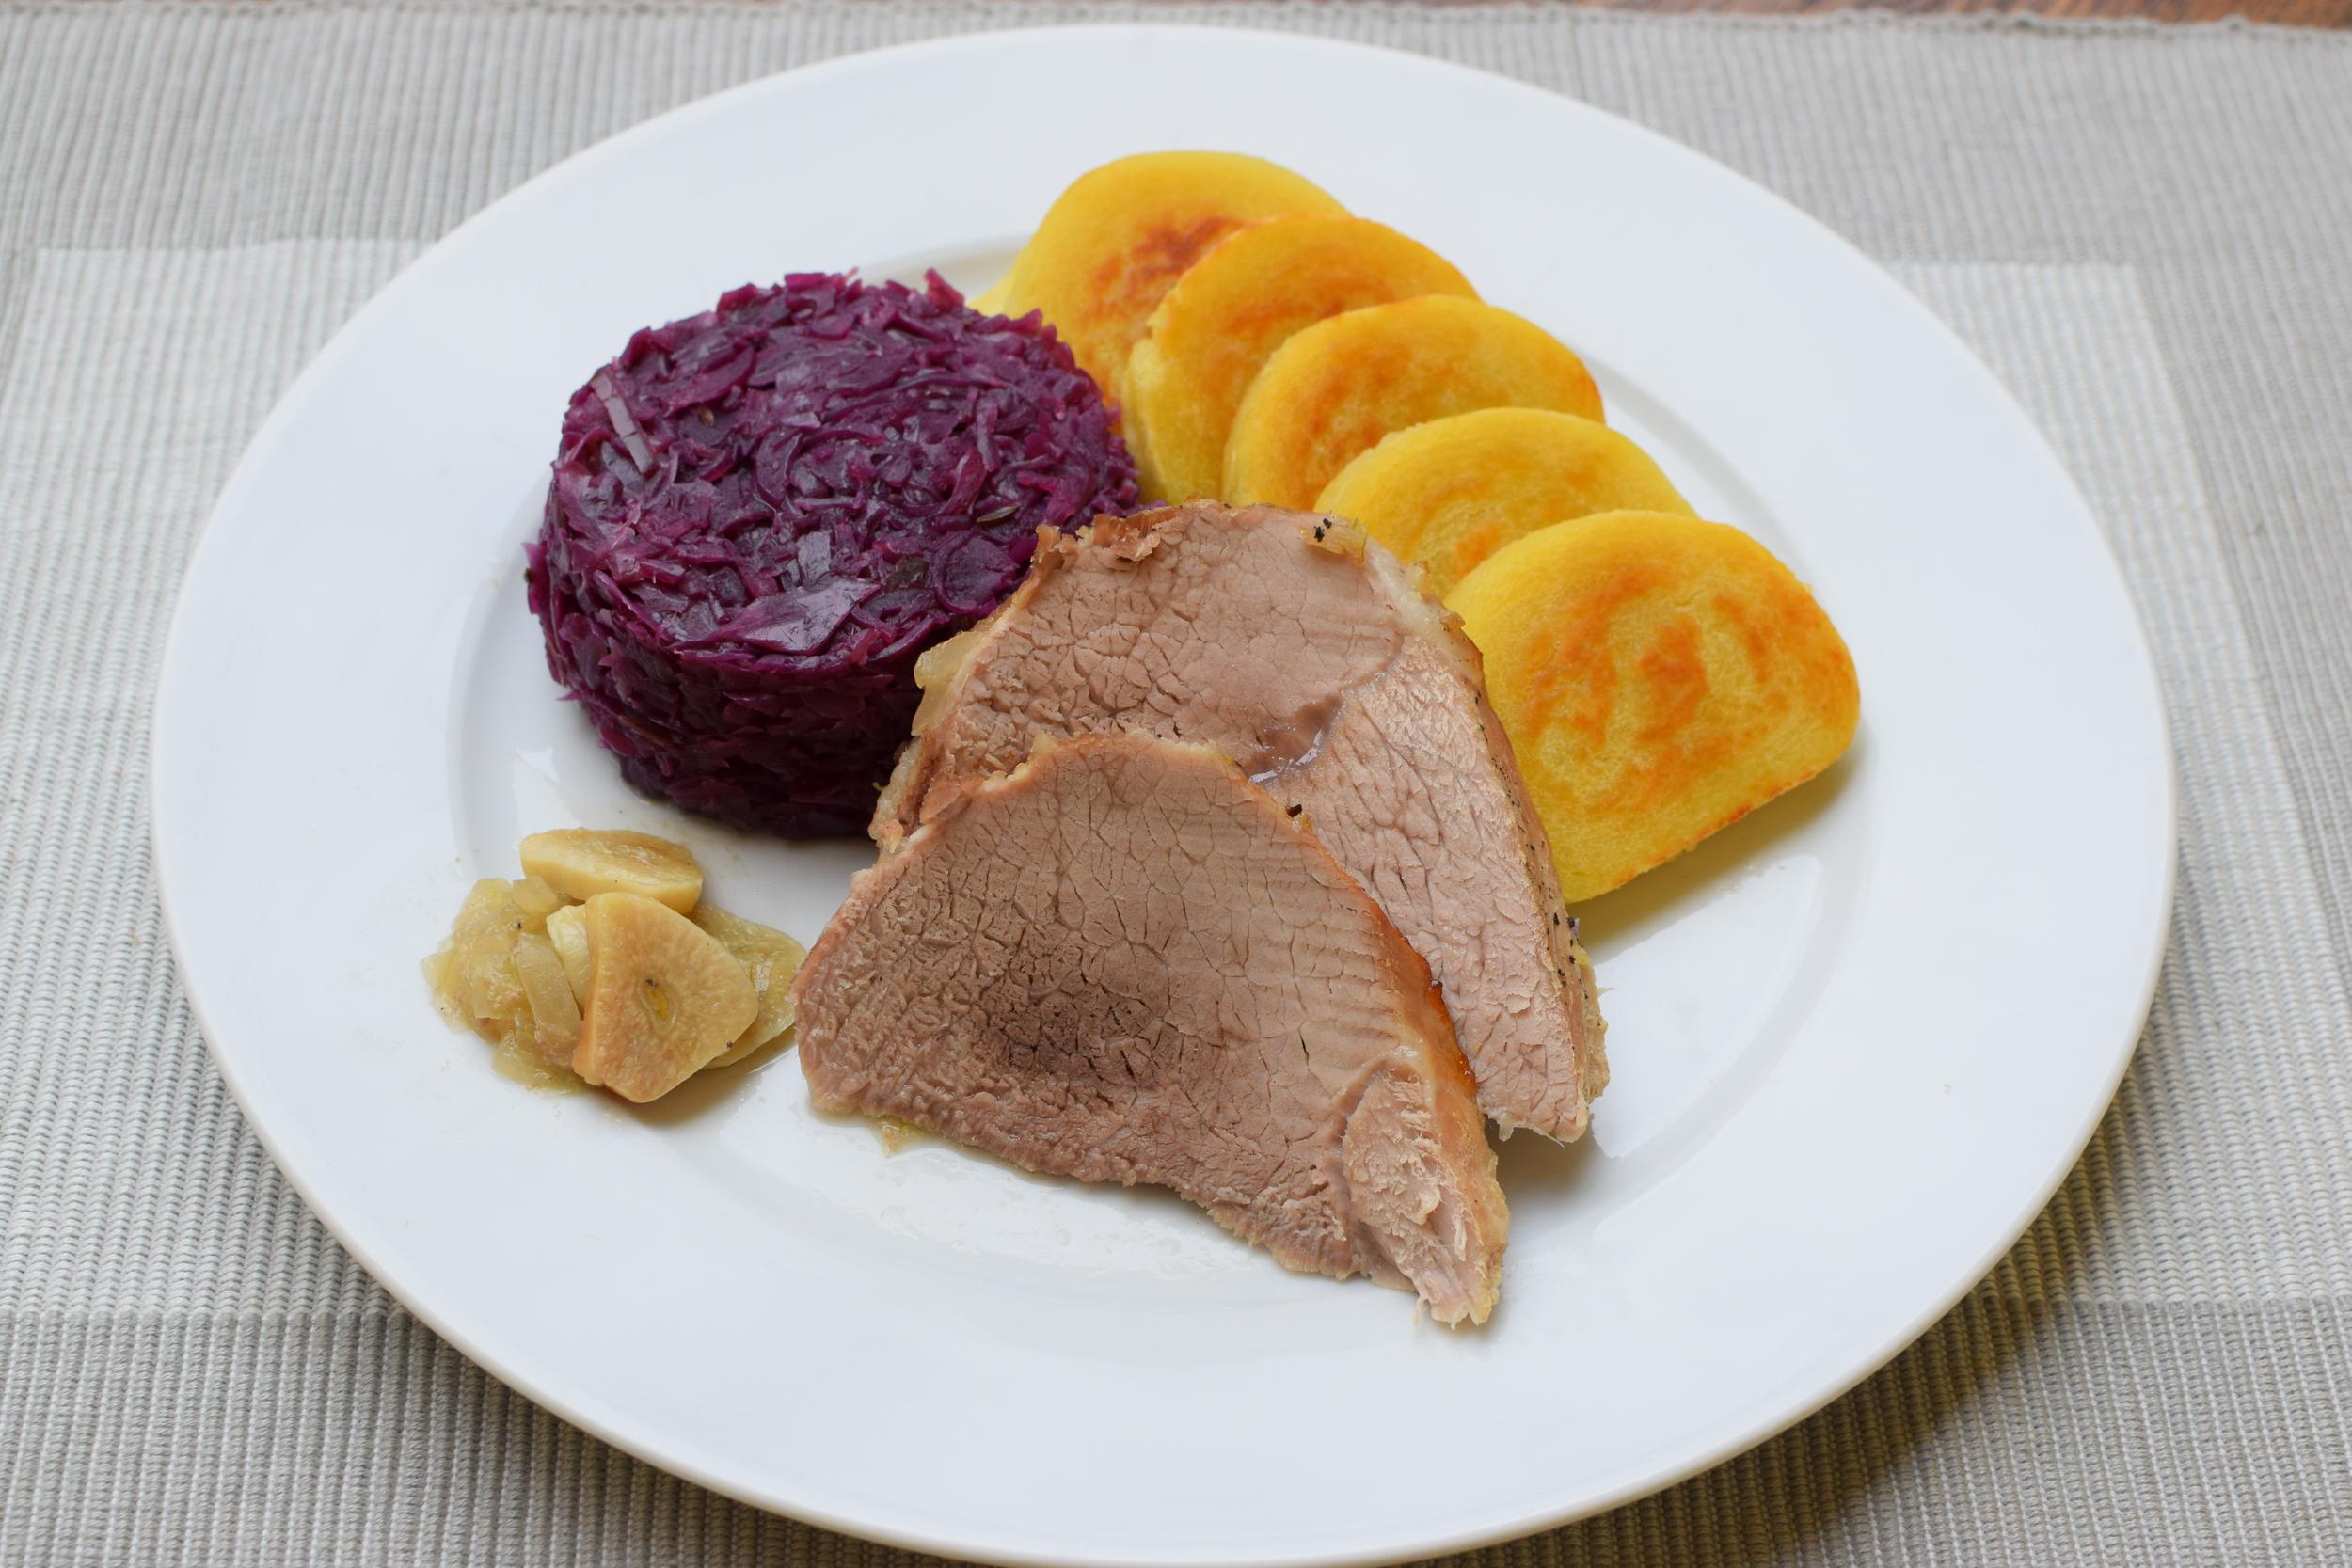 knedlo-vepřo-zelo (opékaný bramborový knedlík na pánvi z obou stran)